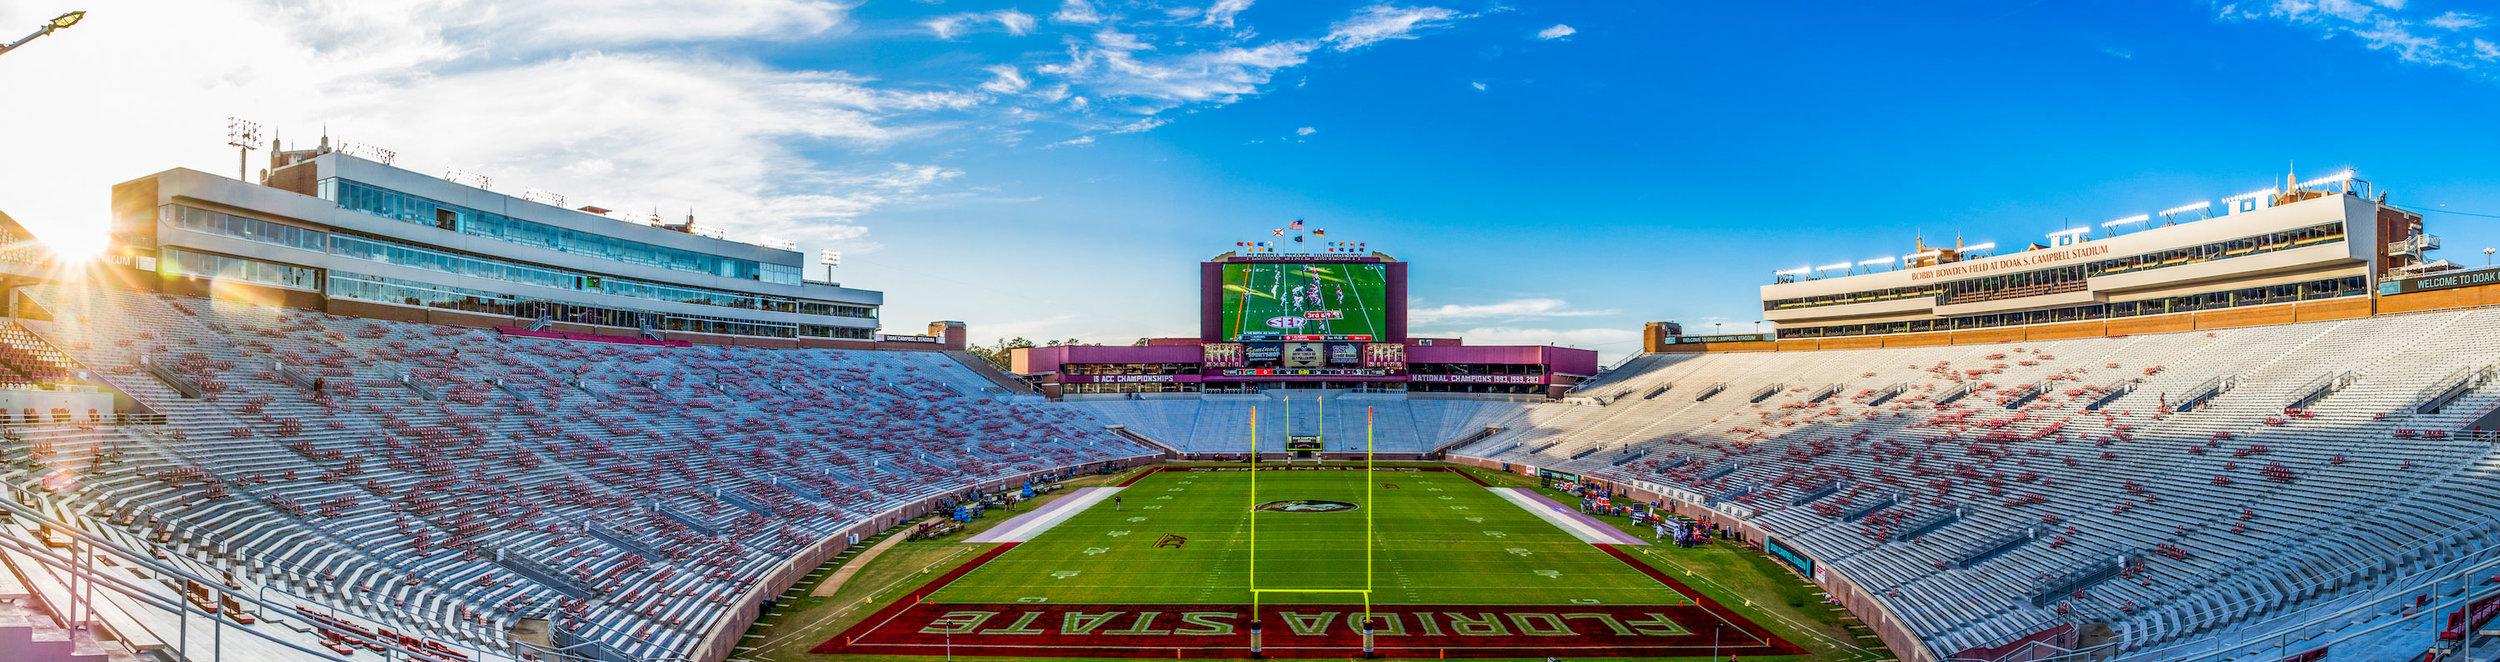 Main-Florida-Stadium-copy.jpg